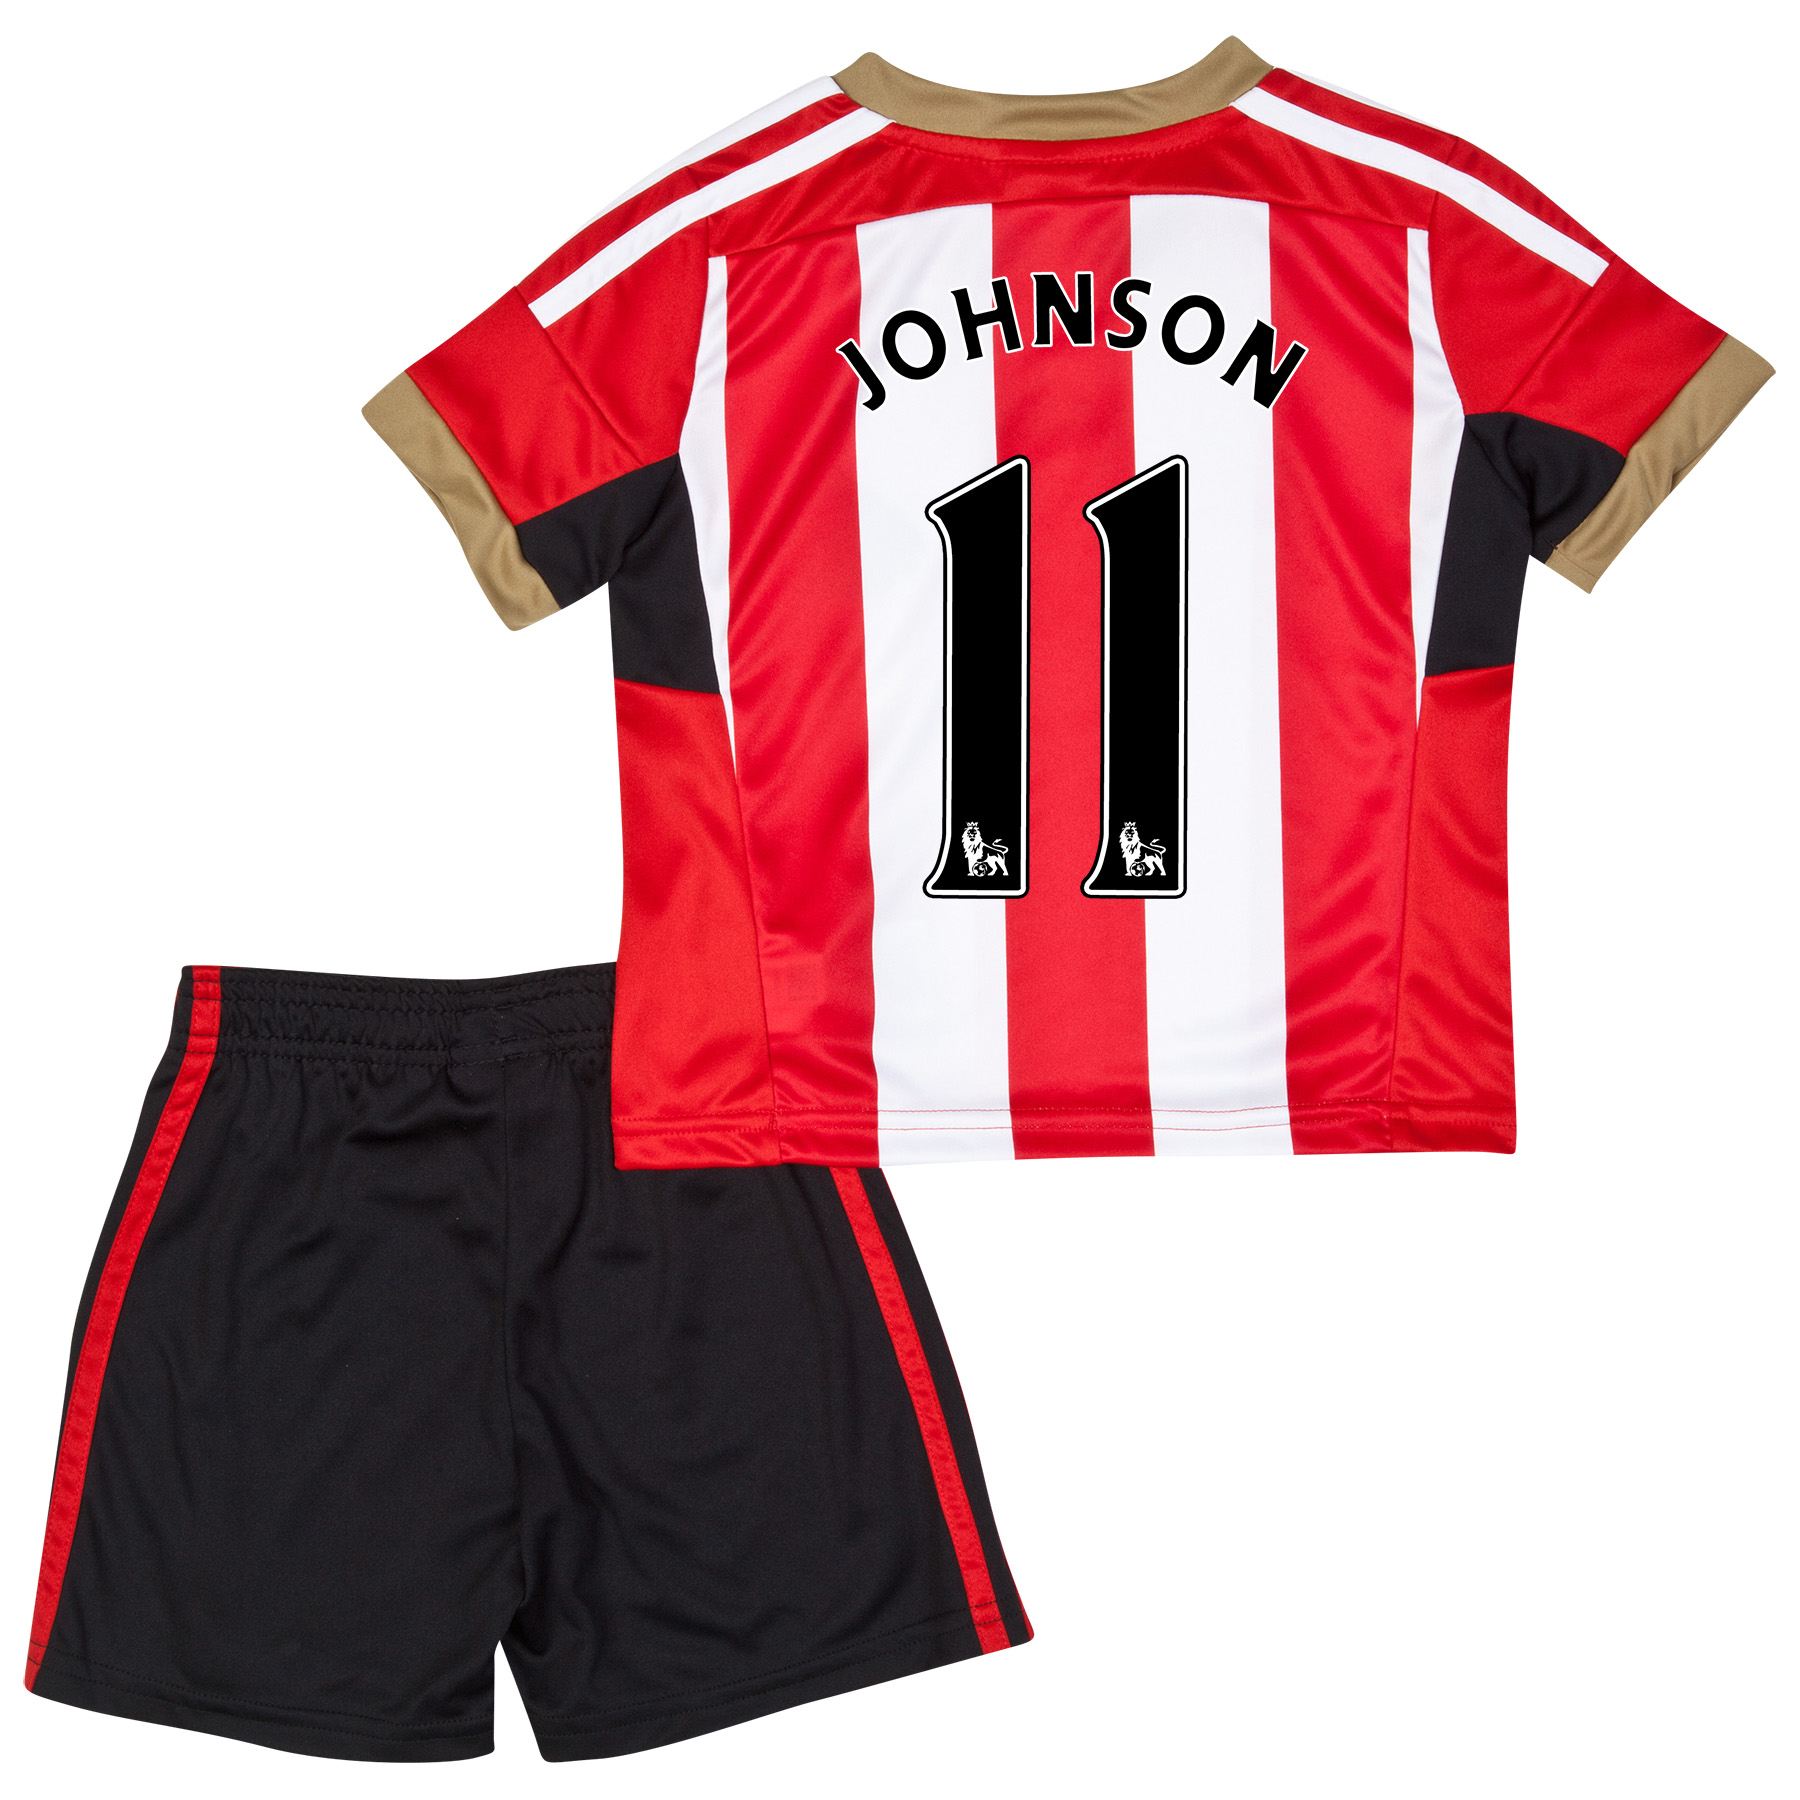 Sunderland Mini Kit 2014/15 Red with Johnson 11 printing